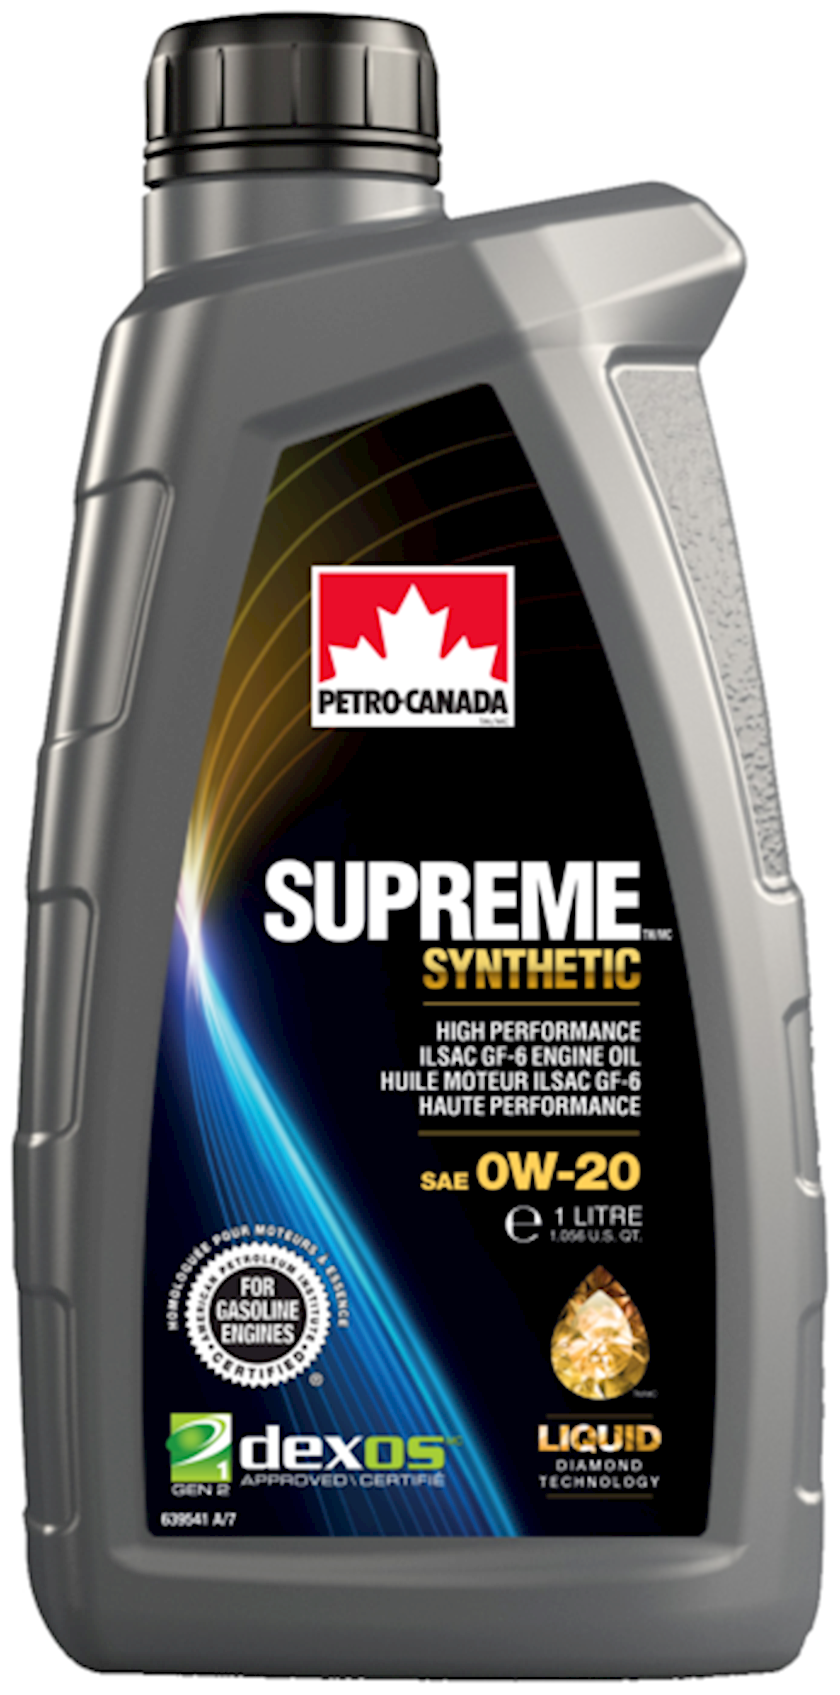 Motor yağı Petro-Canada Supreme Synthetic 0W-20, 1 l